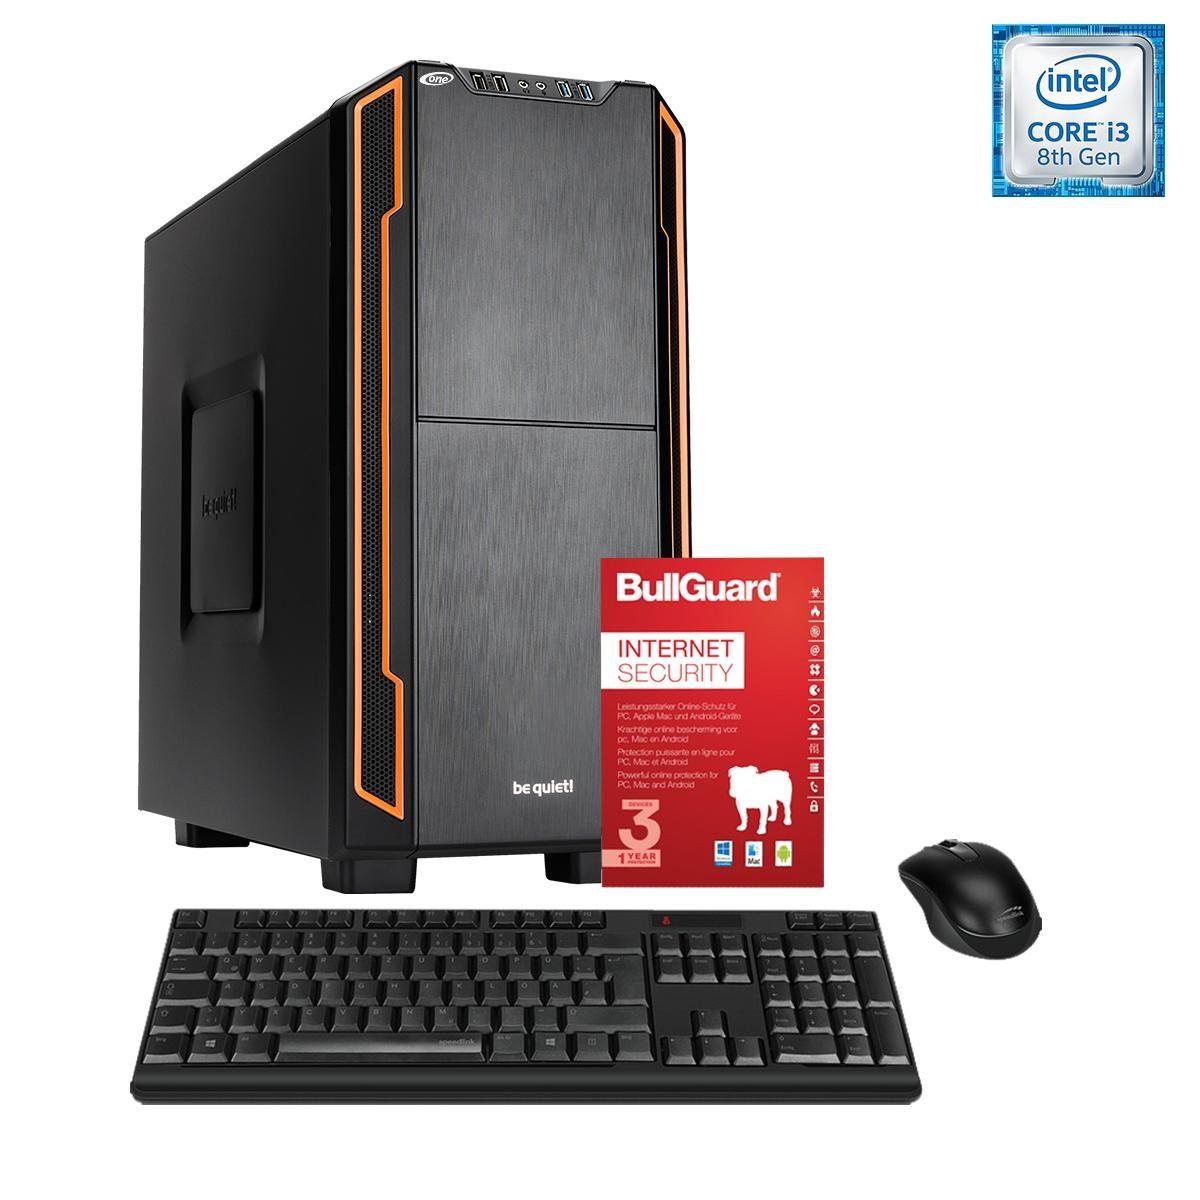 ONE PC, Core i3-8350K, GeForce GTX 1050 Ti, 8GB DDR4 RAM »PC 44095«